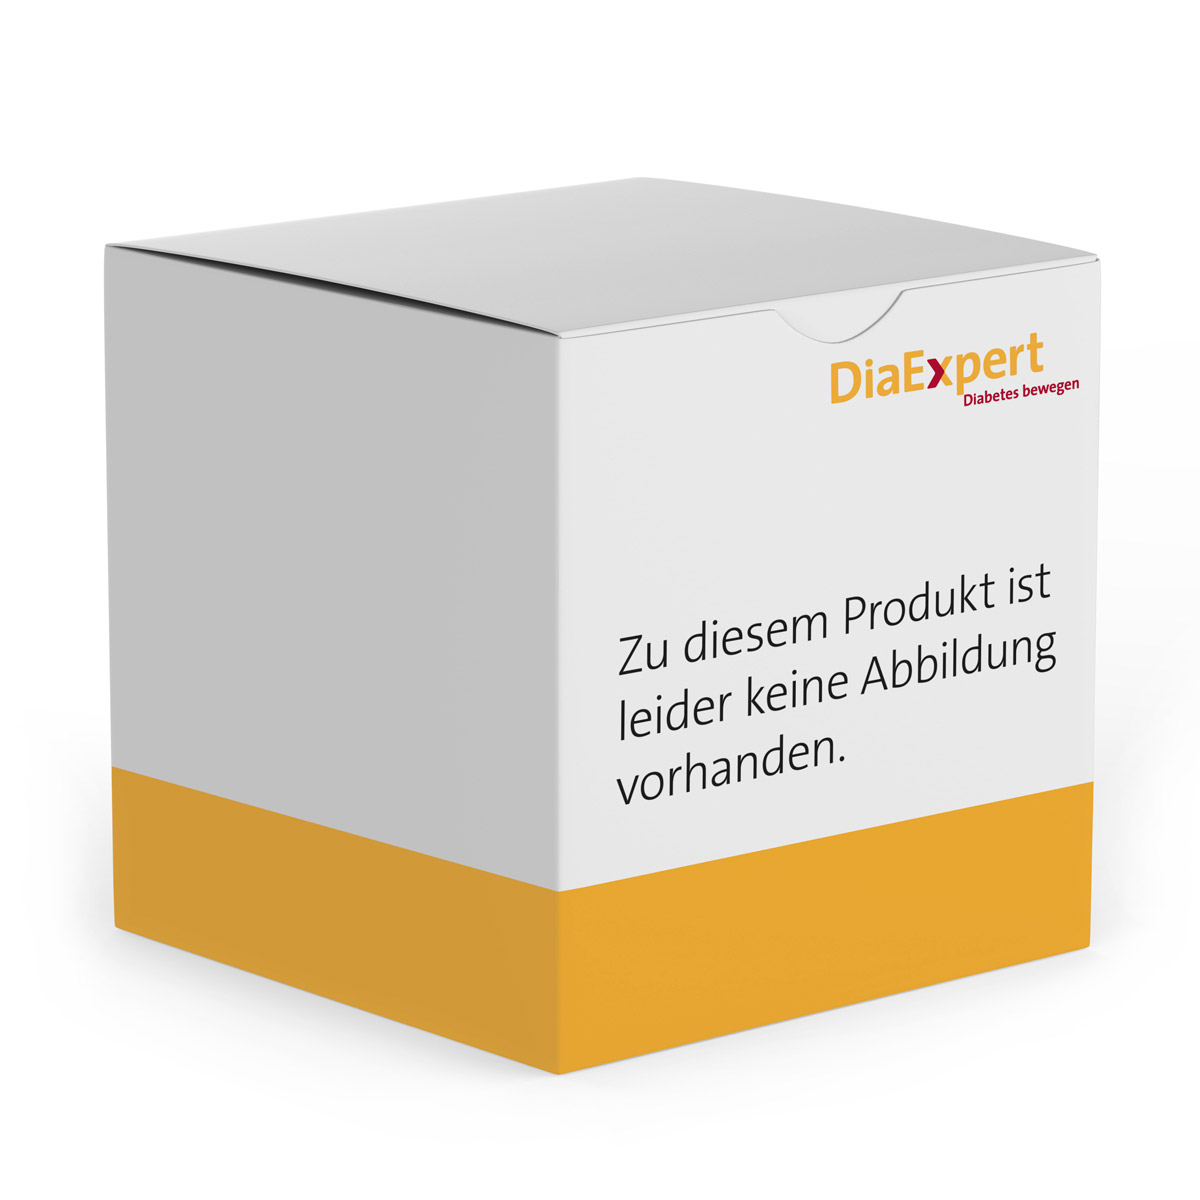 Aquapac Insulinpumpen-Tasche groß 22 cm x 12,5 cm